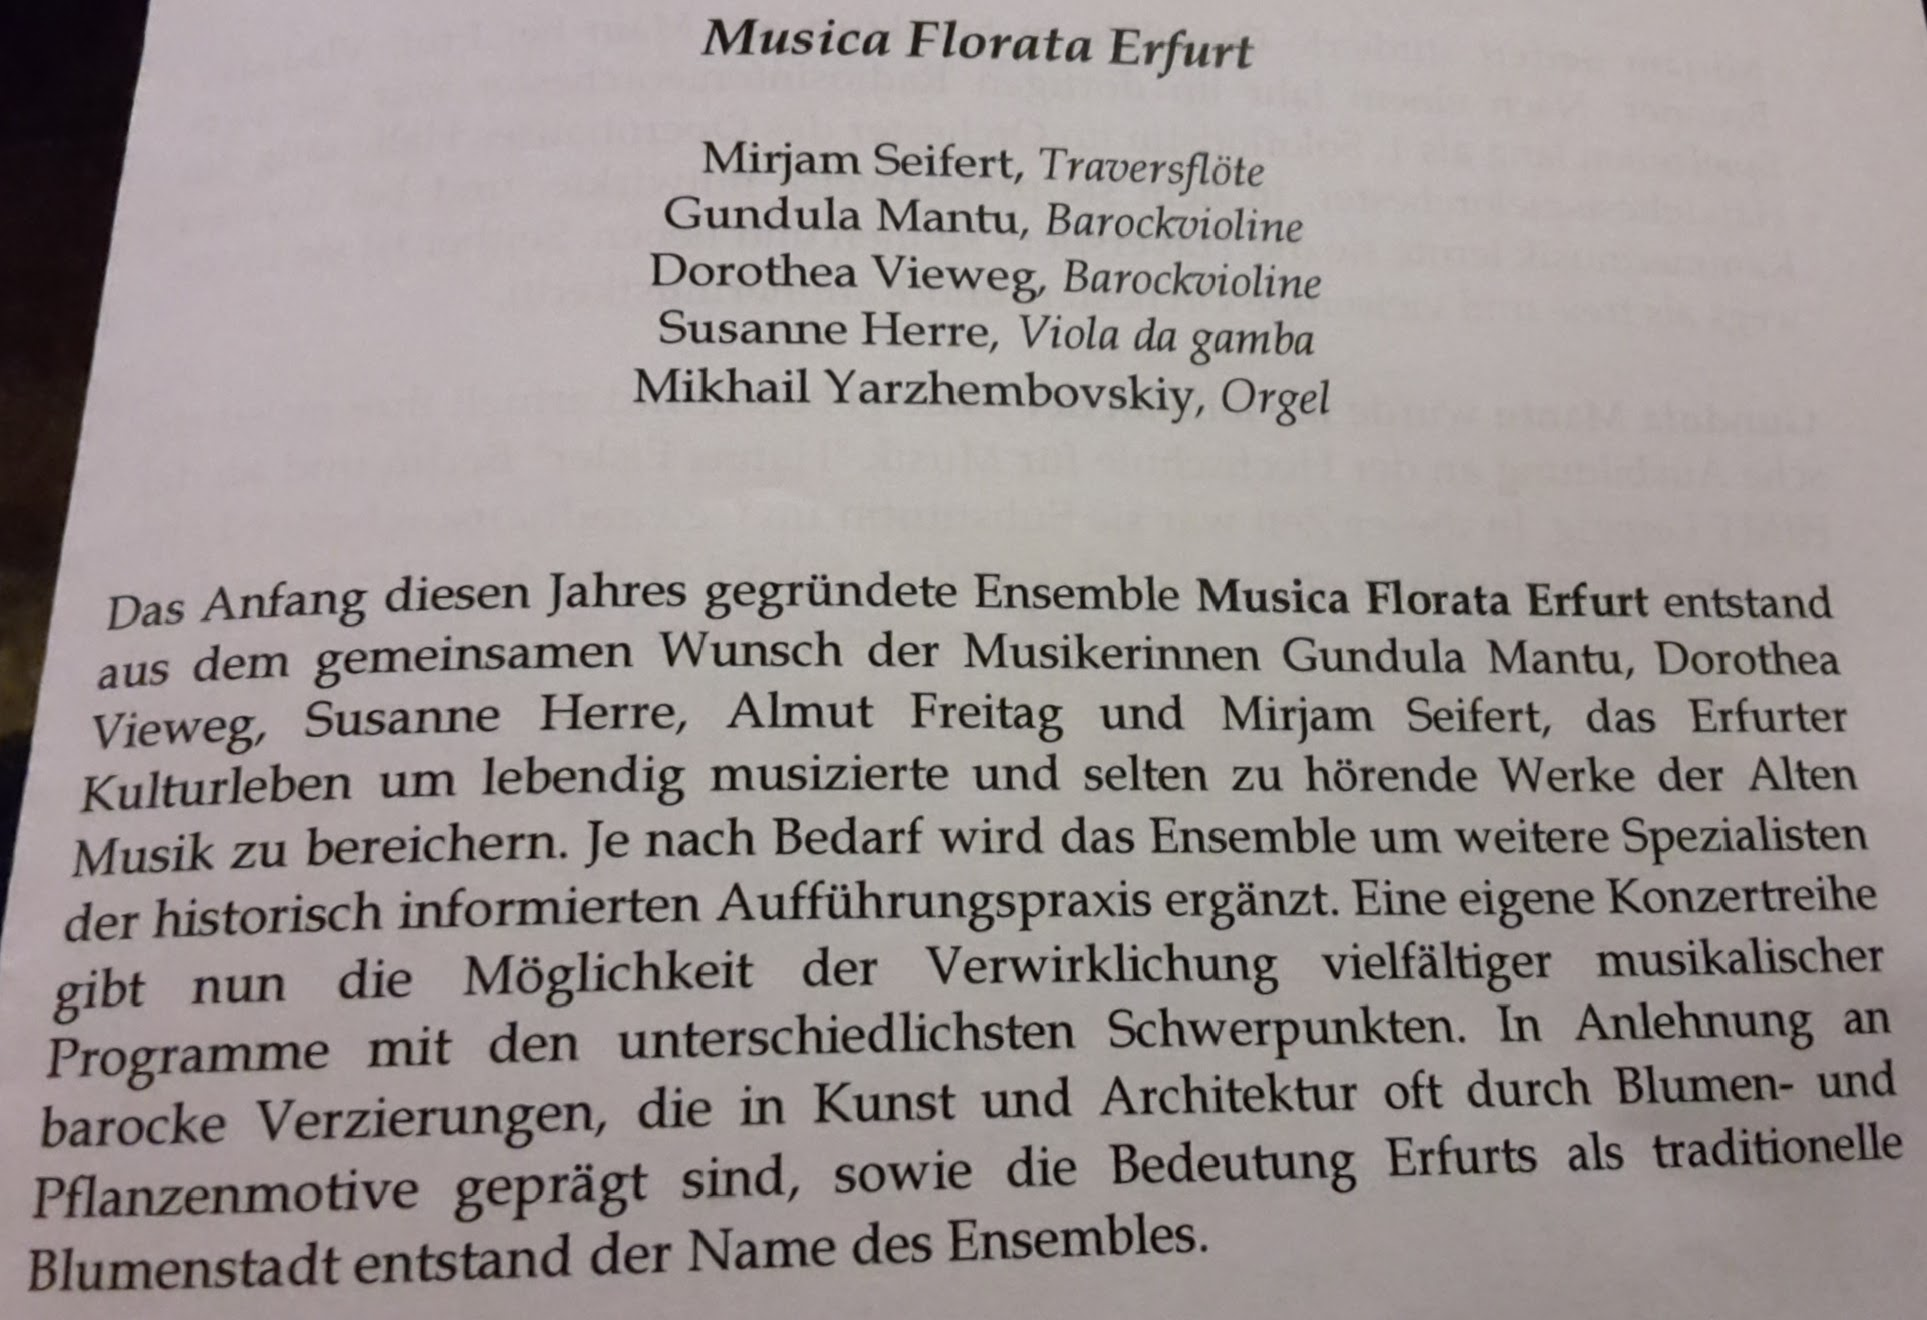 2017.12.31. musica florata erfurt 4 Michaeliskirche